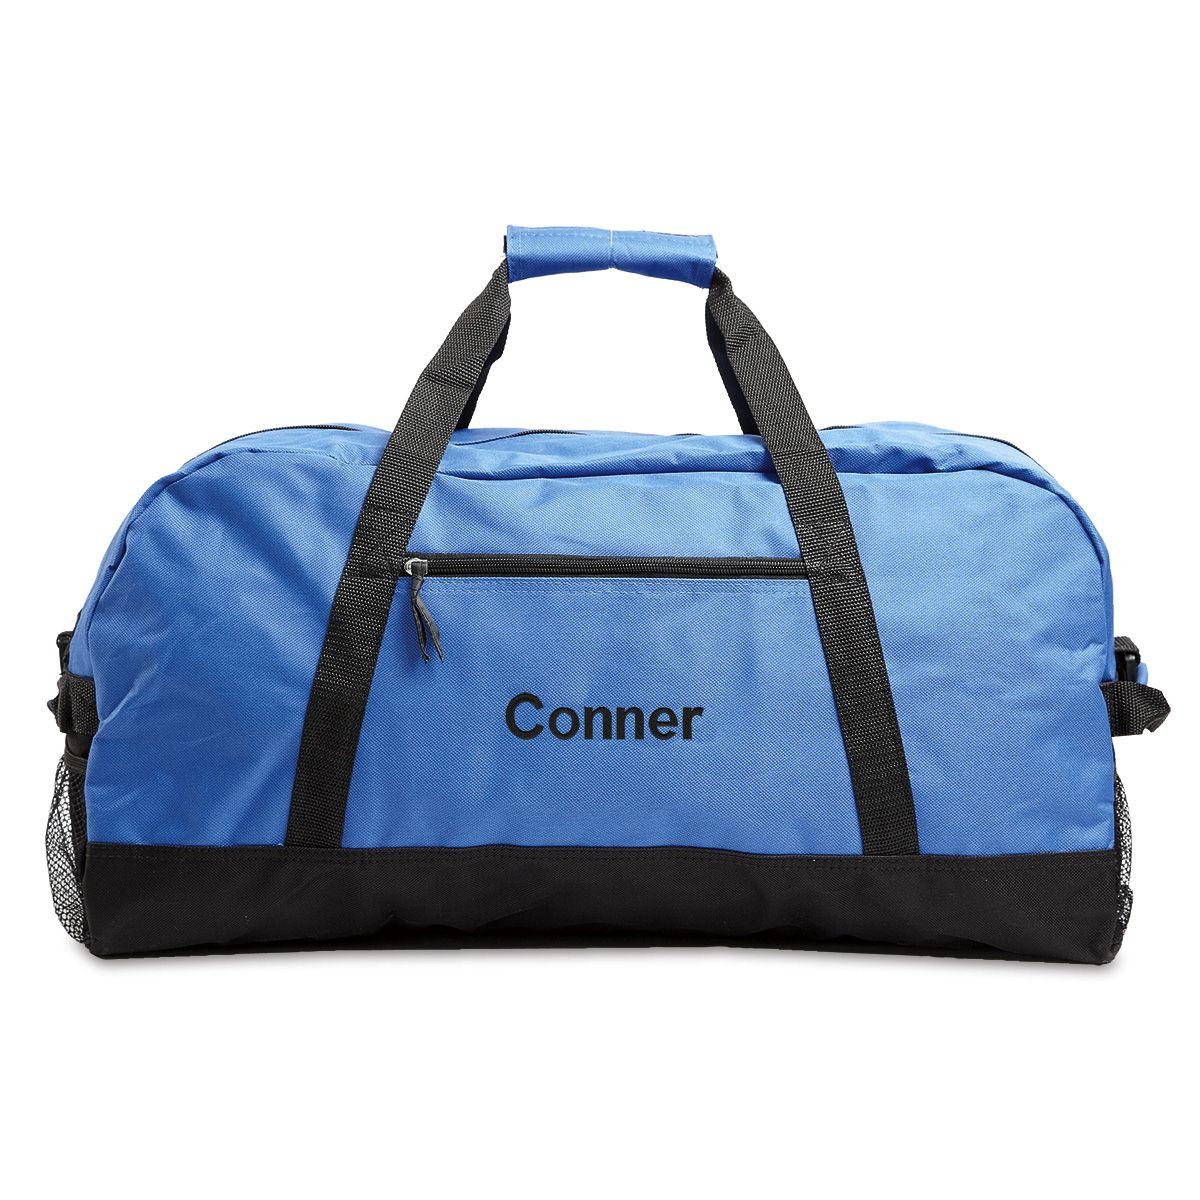 "Blue and Black 23"" Duffel Bag"